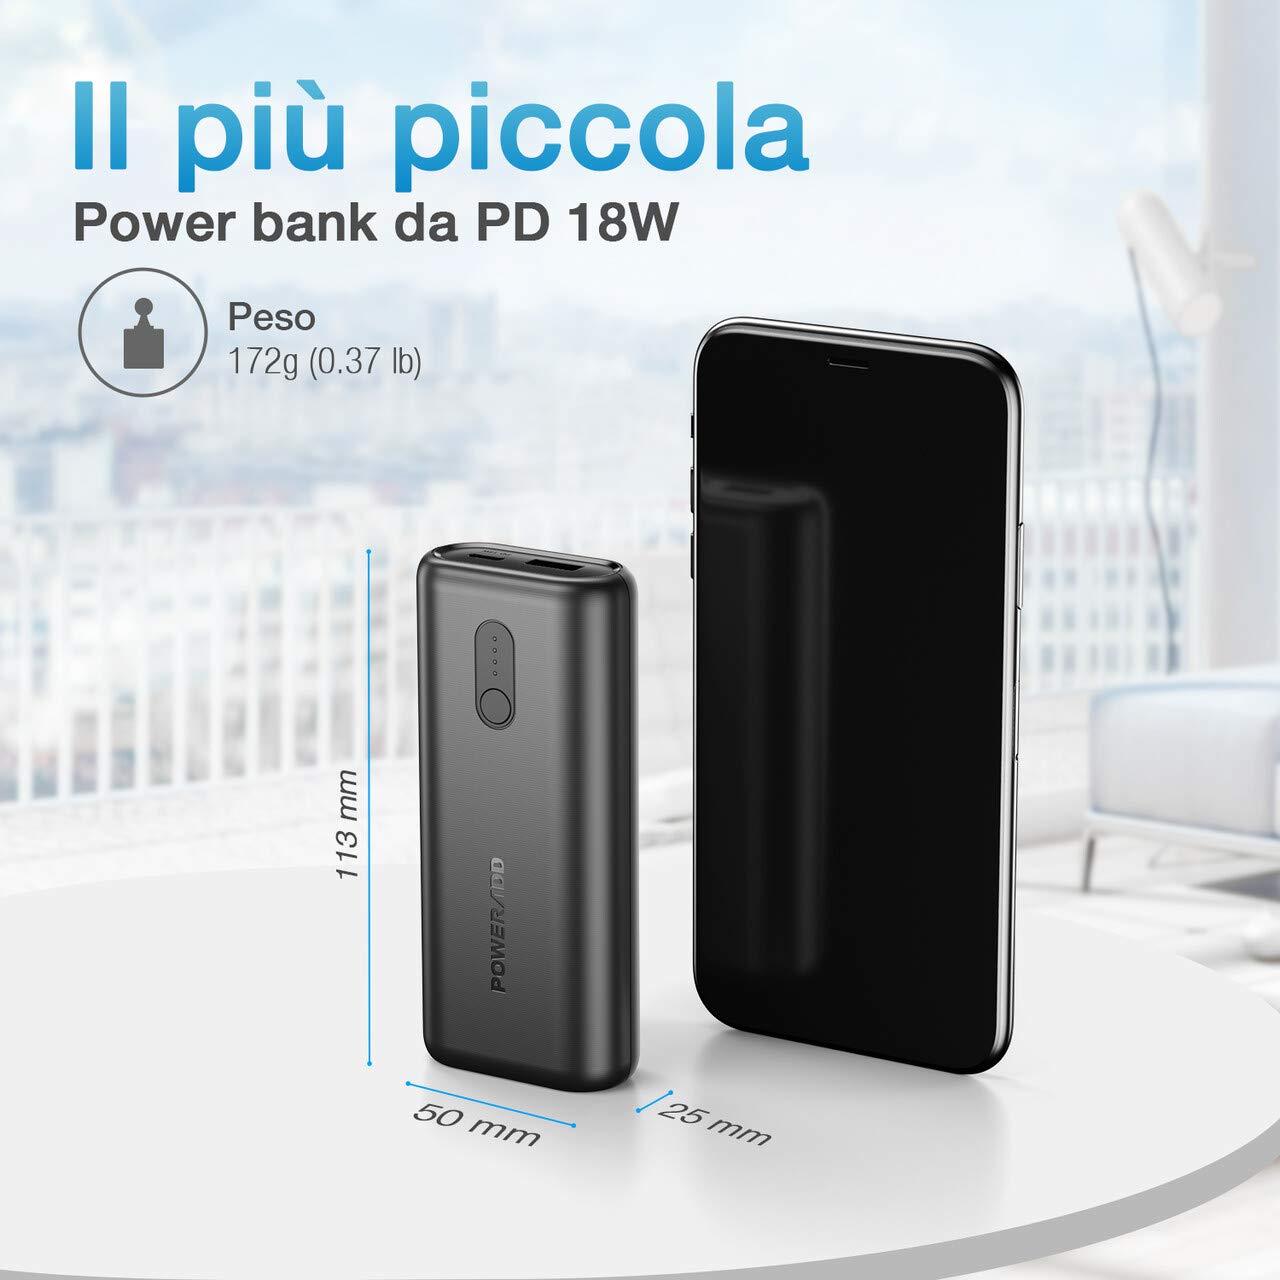 POWERADD EnergyCell Power Bank 10000mAh da PD18W, Caricabatterie Portatile con Porta Type-C + USB Uscita, Ricarica Veloce per iPhone, Samsung, Huawei, Xiaomi